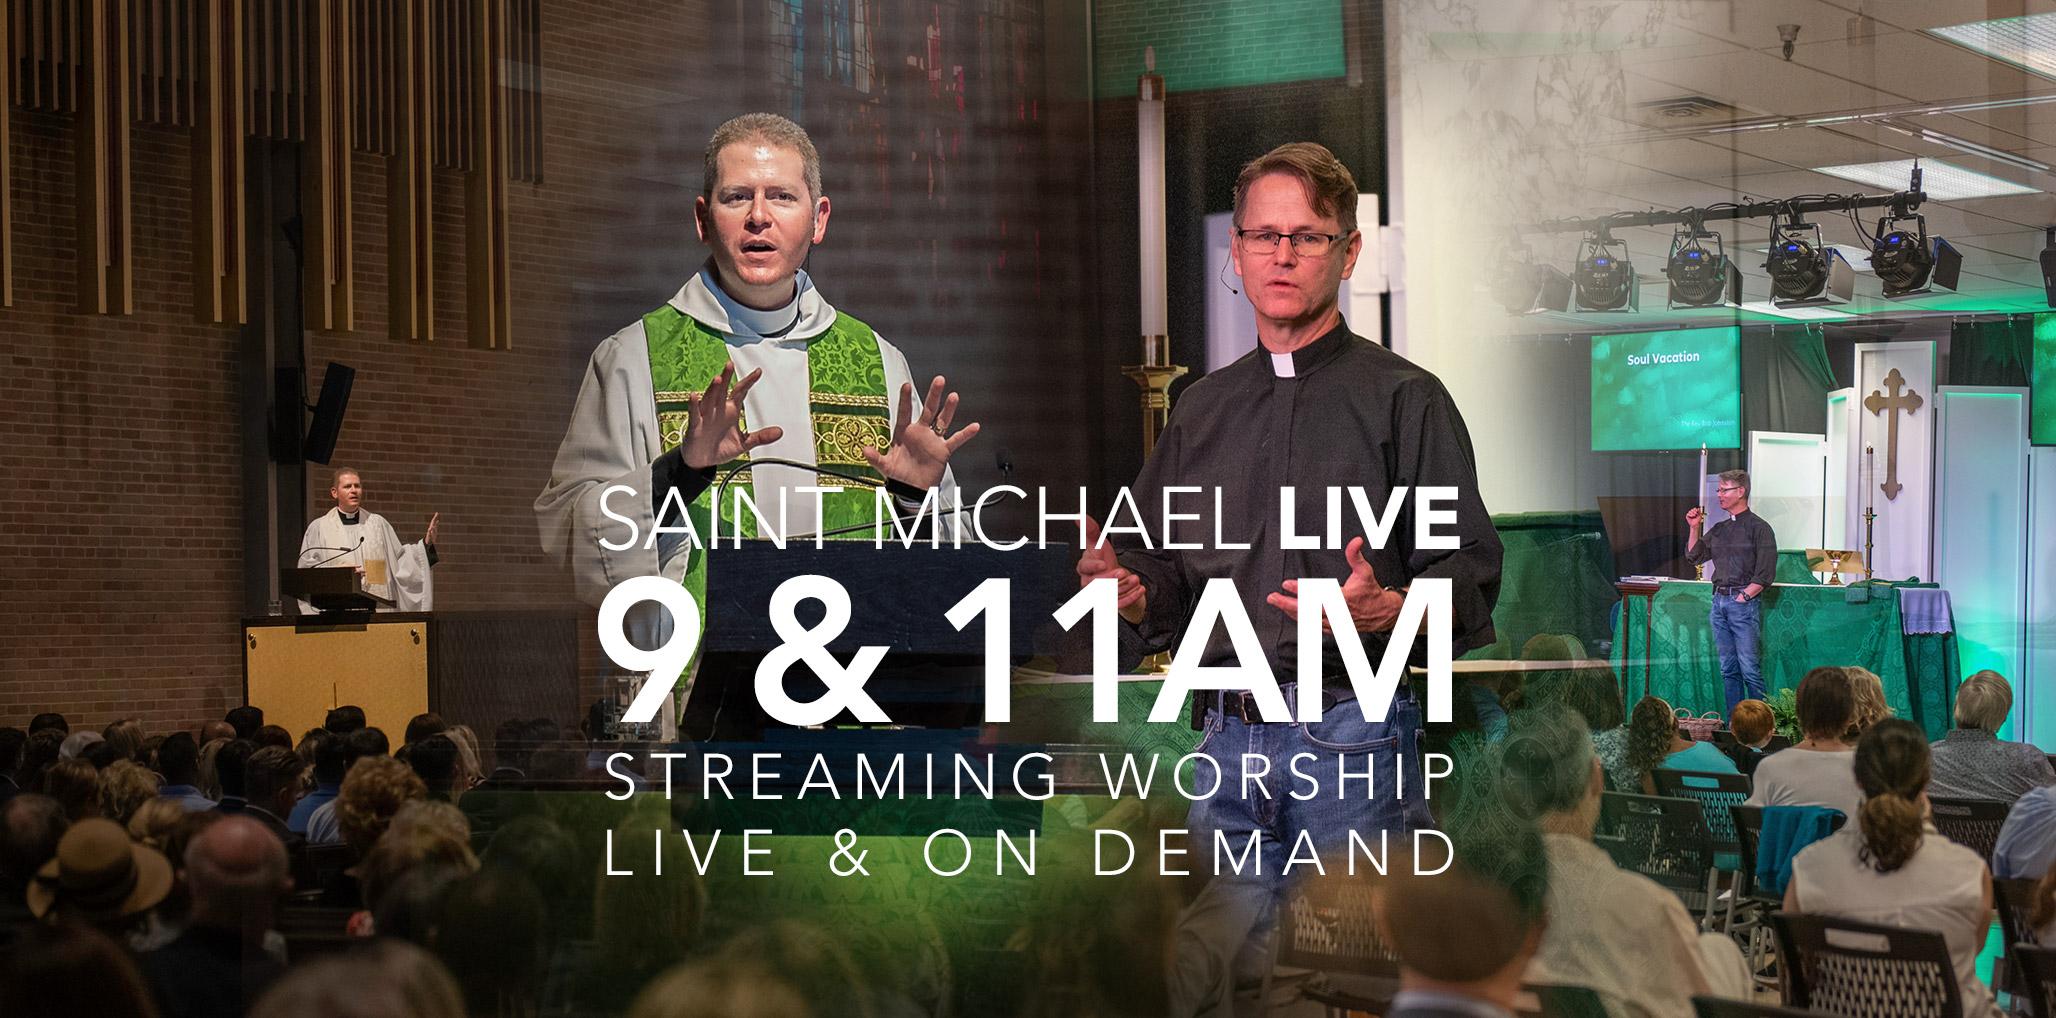 https://saintmichael.org/live/